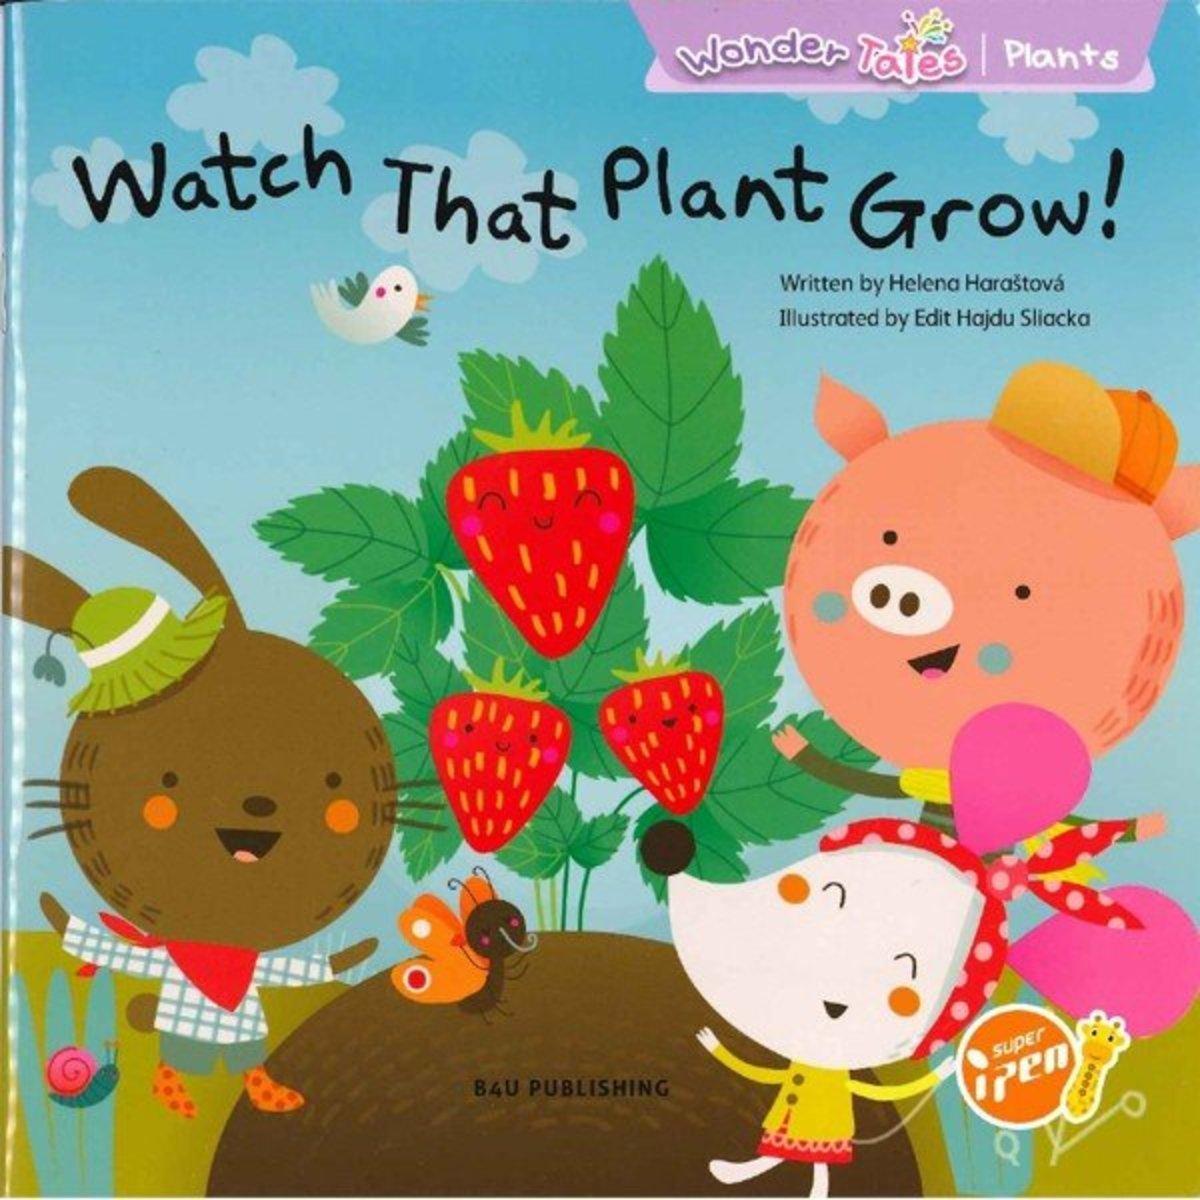 Wonder Tales 英文繪本 (K1)—Watch That Plant Grow! (Non-fiction)